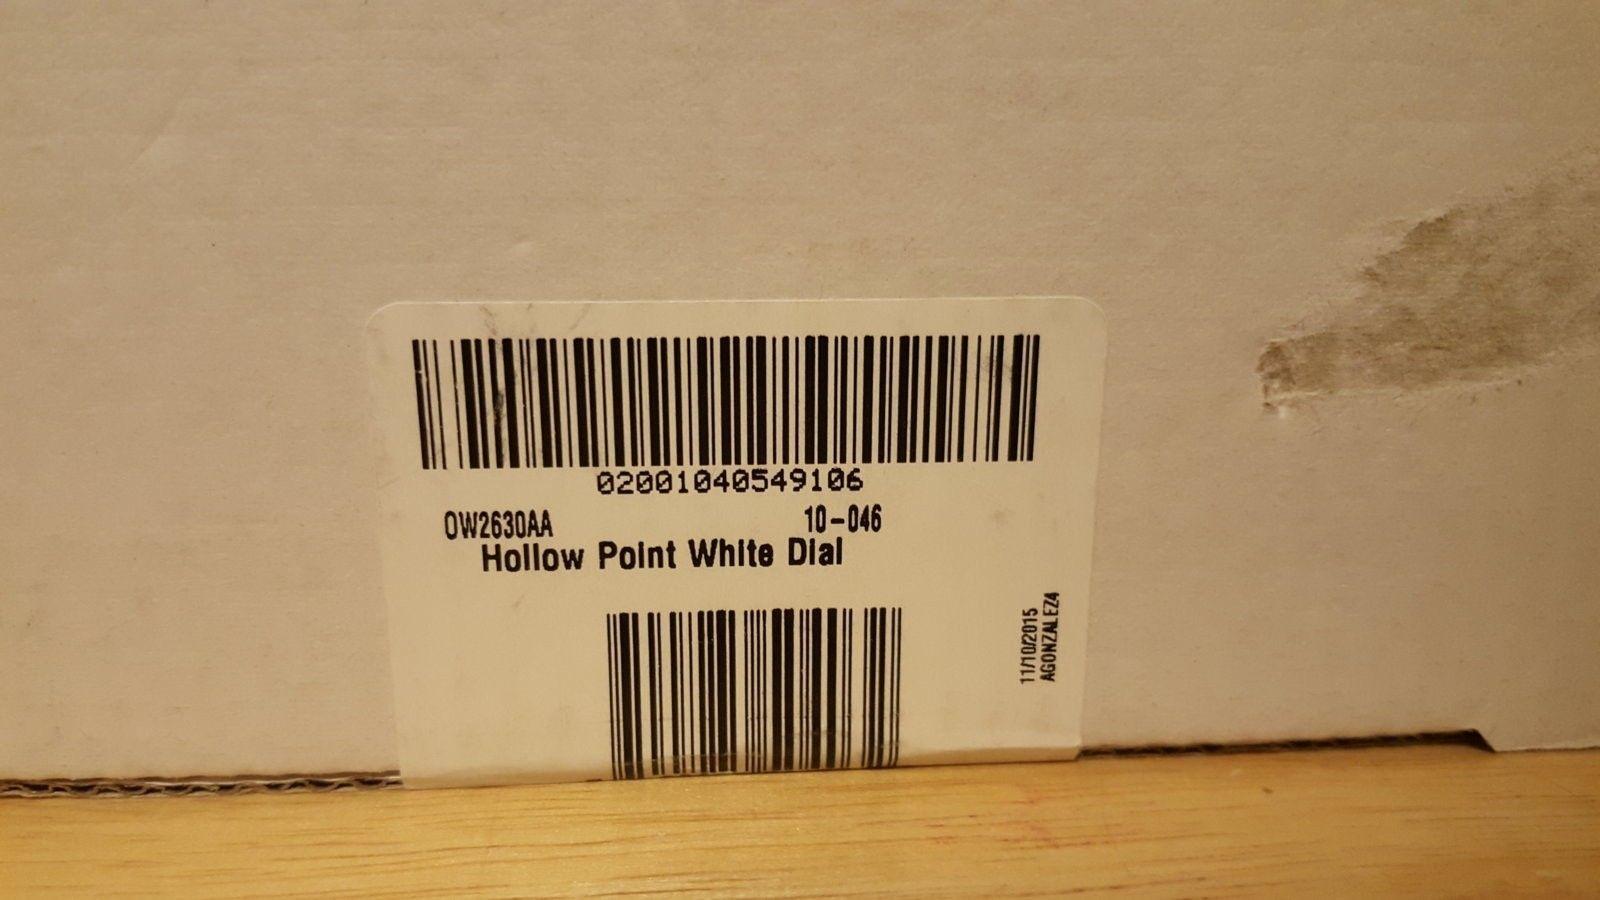 BNIB White Dial Hollow Point Watch $980 Shipped - 20160326_191742.jpg